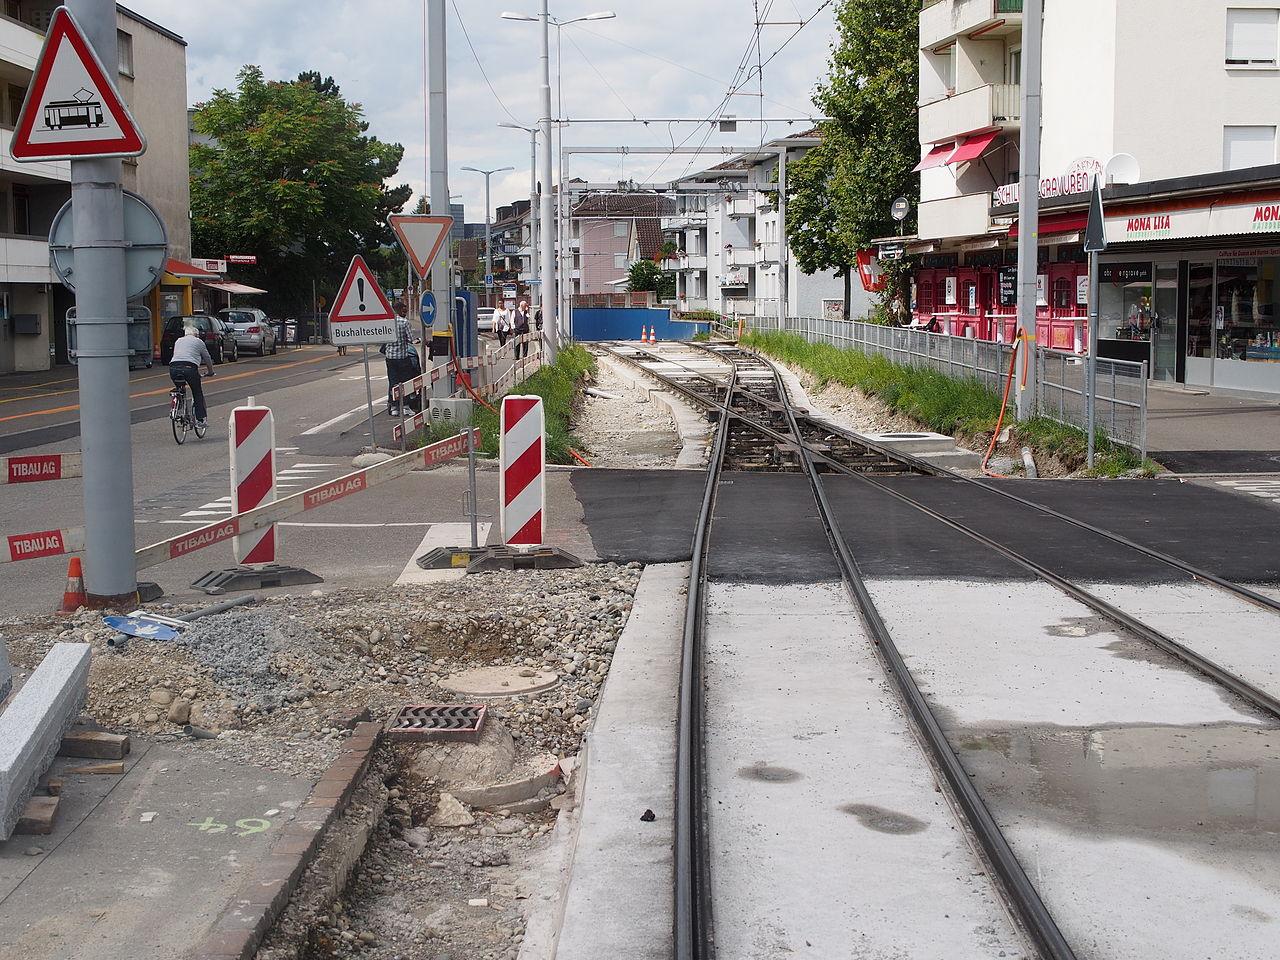 1280px-Schwamendingen-Mitte_Tramtunnel_2_2014-08-24.JPG